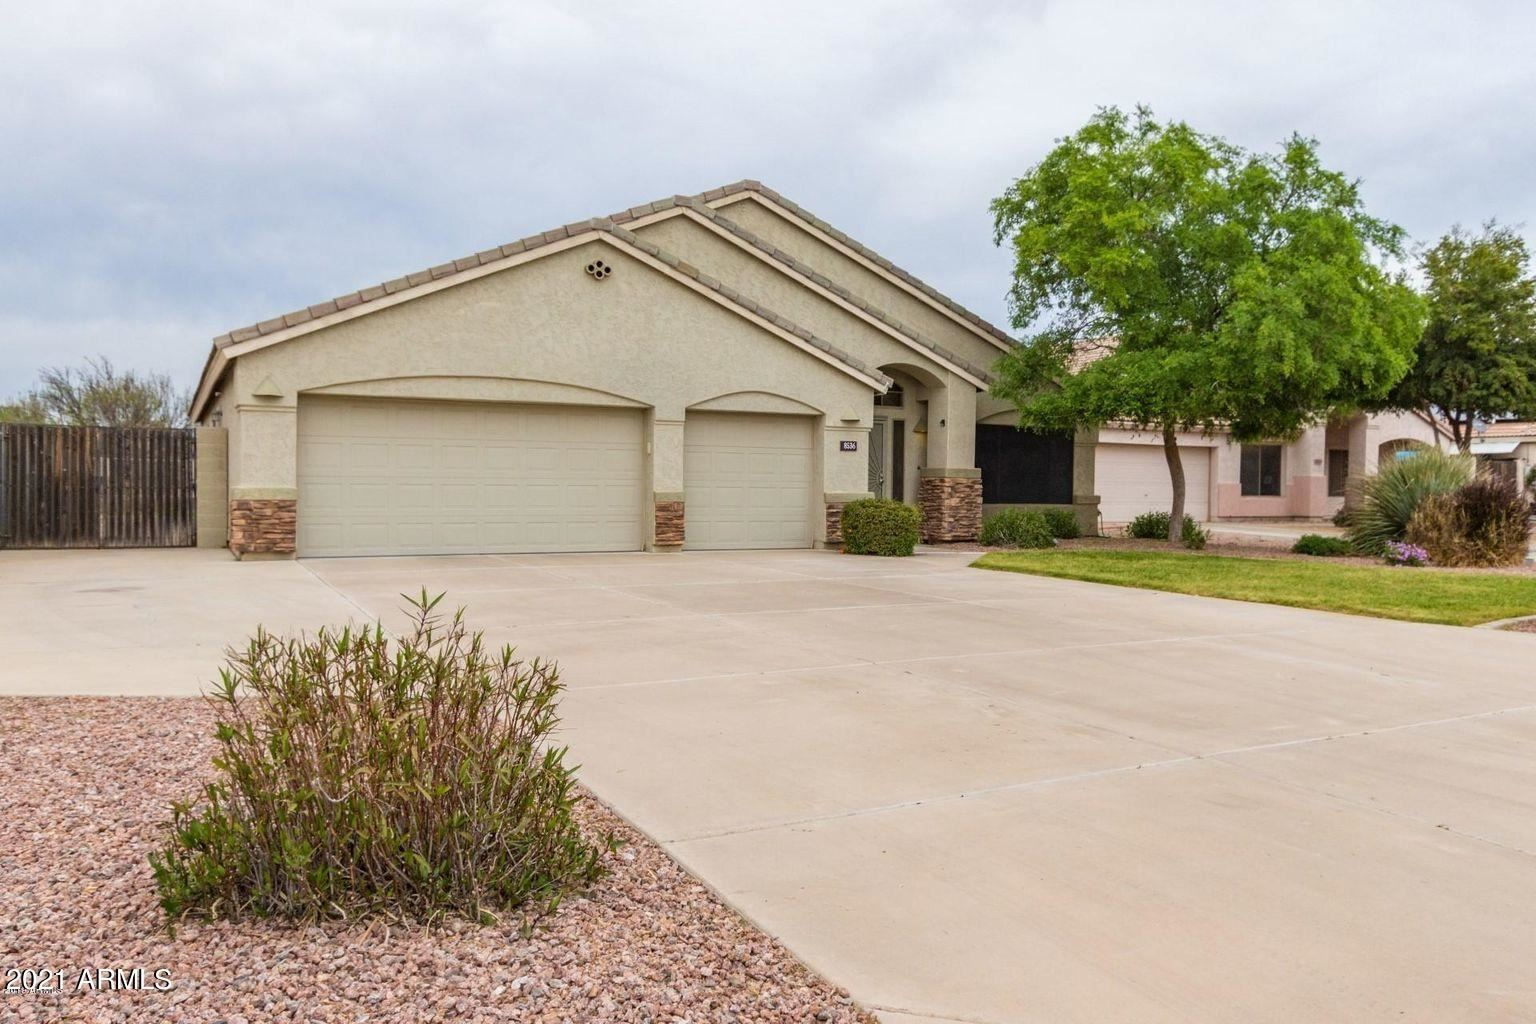 Photo of 8536 E PAMPA Circle, Mesa, AZ 85212 (MLS # 6249694)